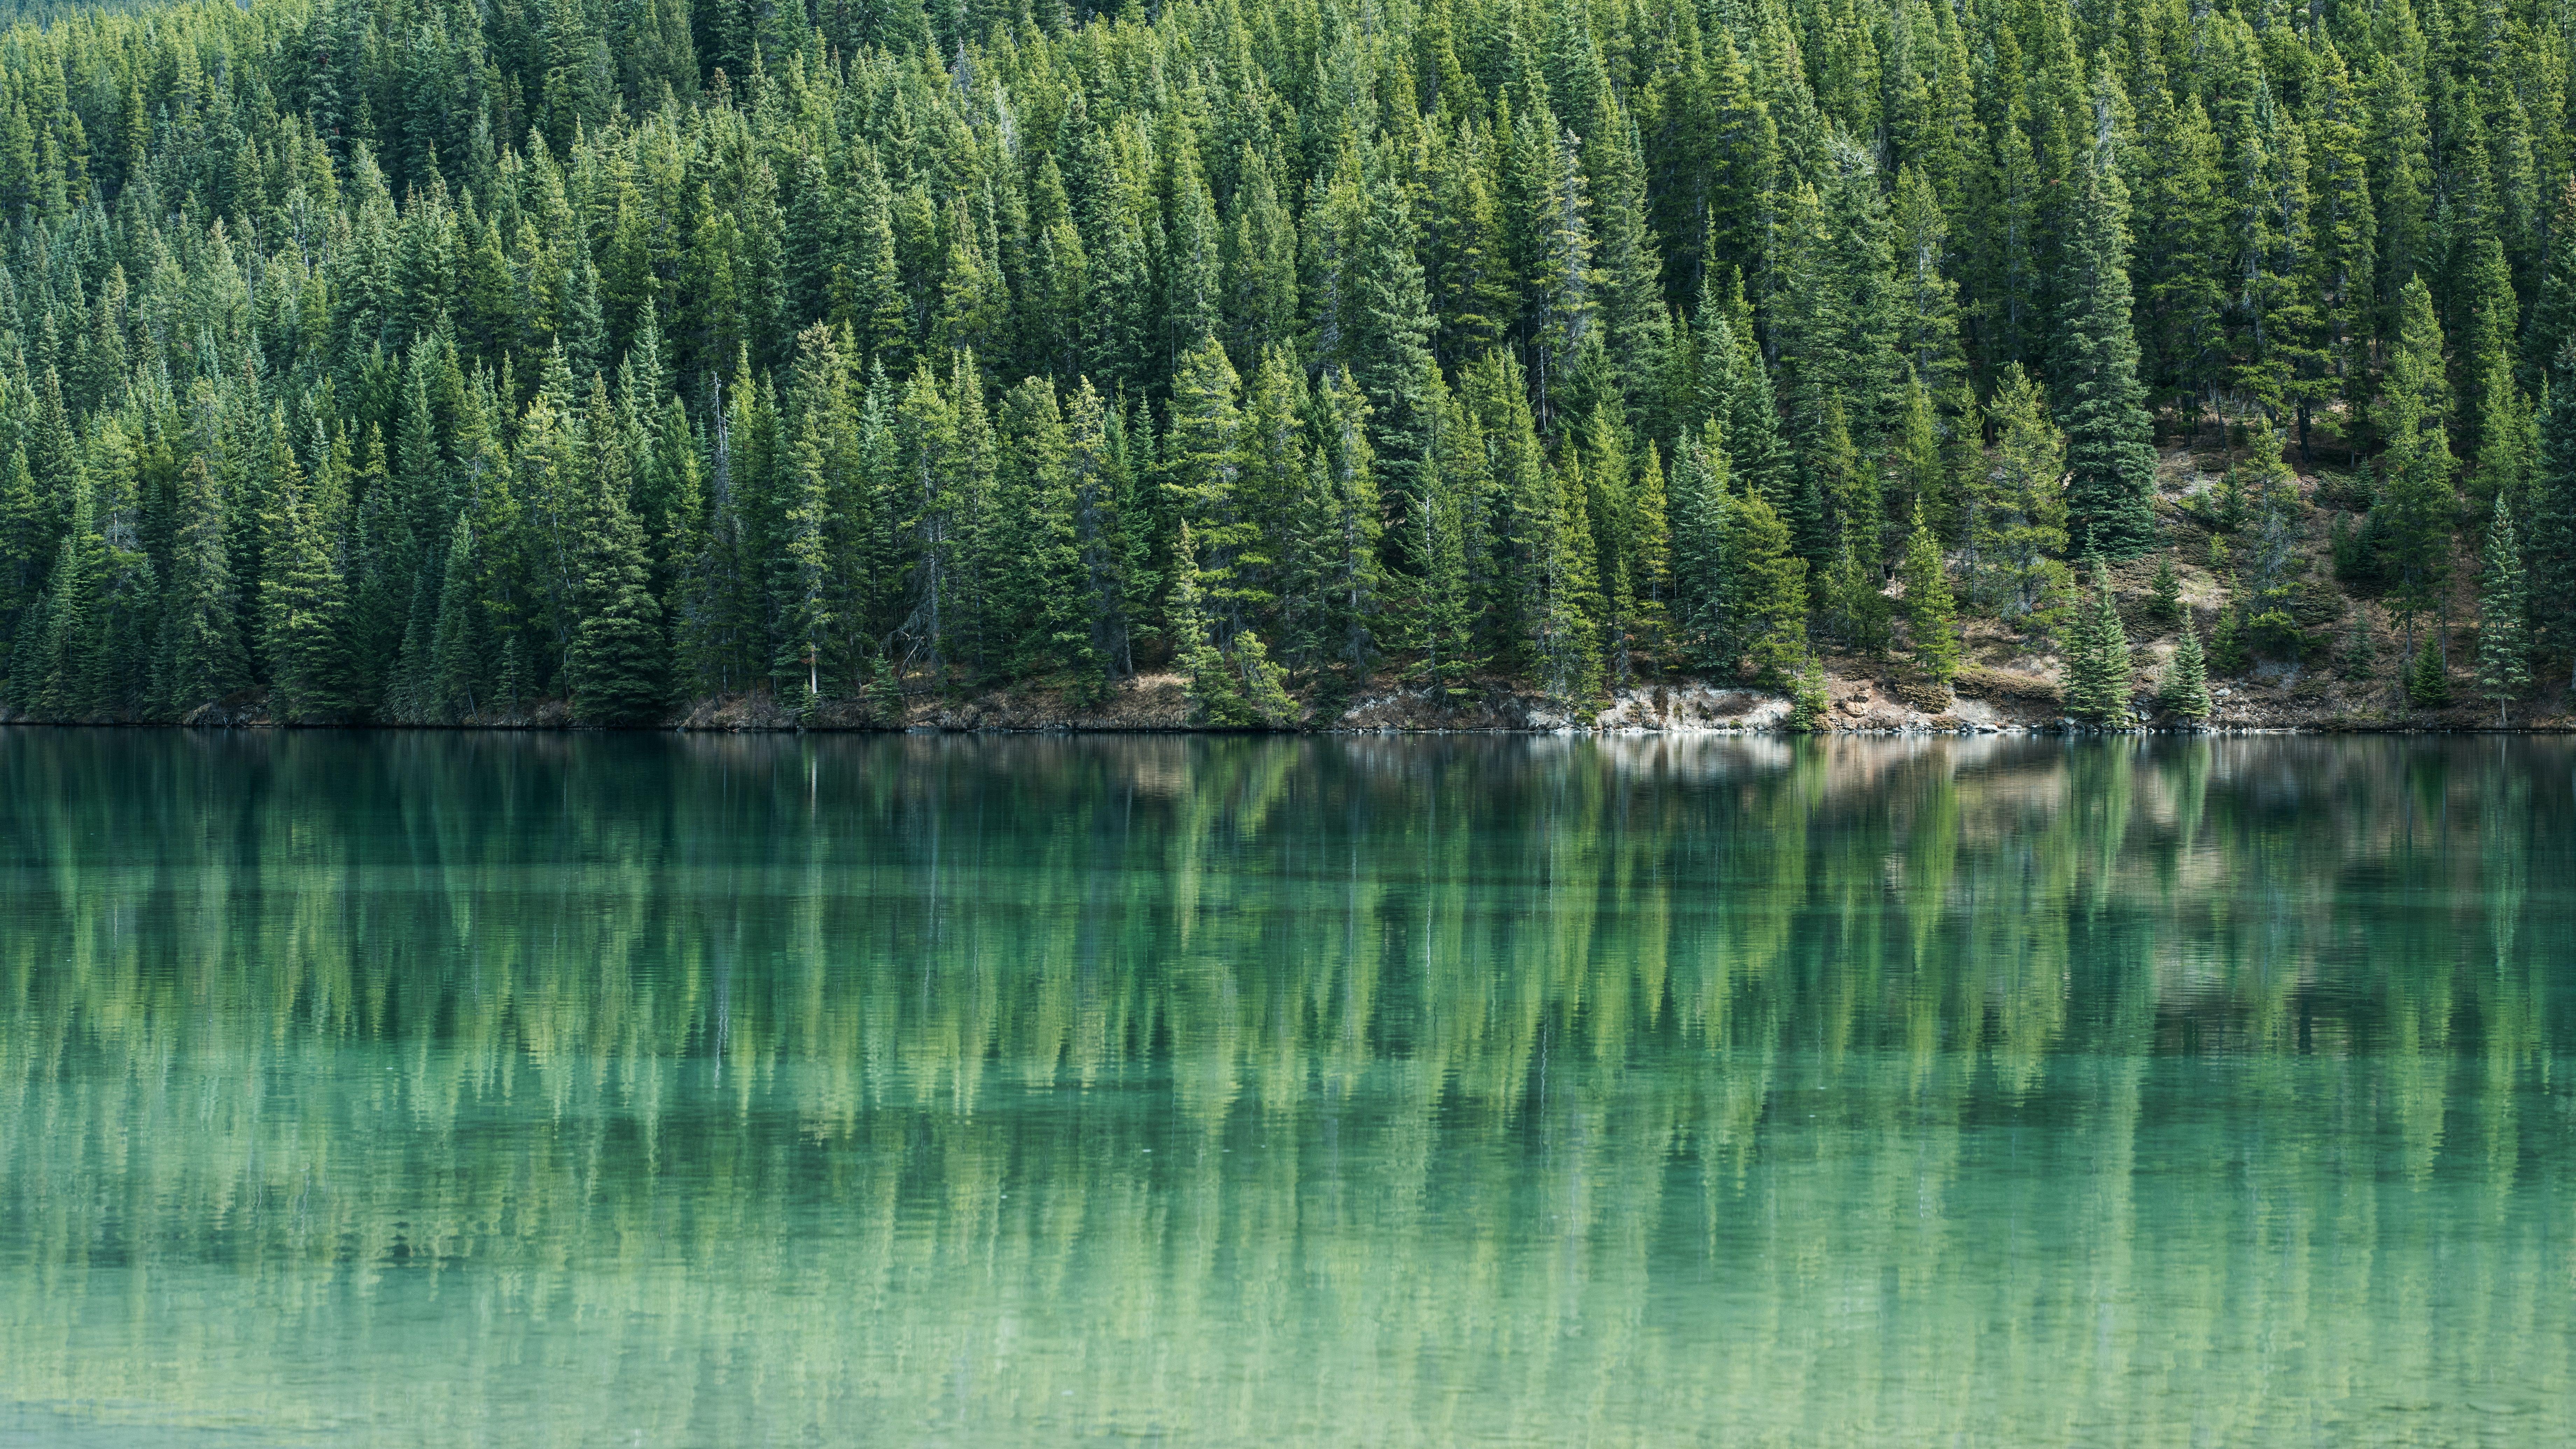 HD Wallpaper A Wooded Shore Seen Across An Emerald Green Lake In Banff